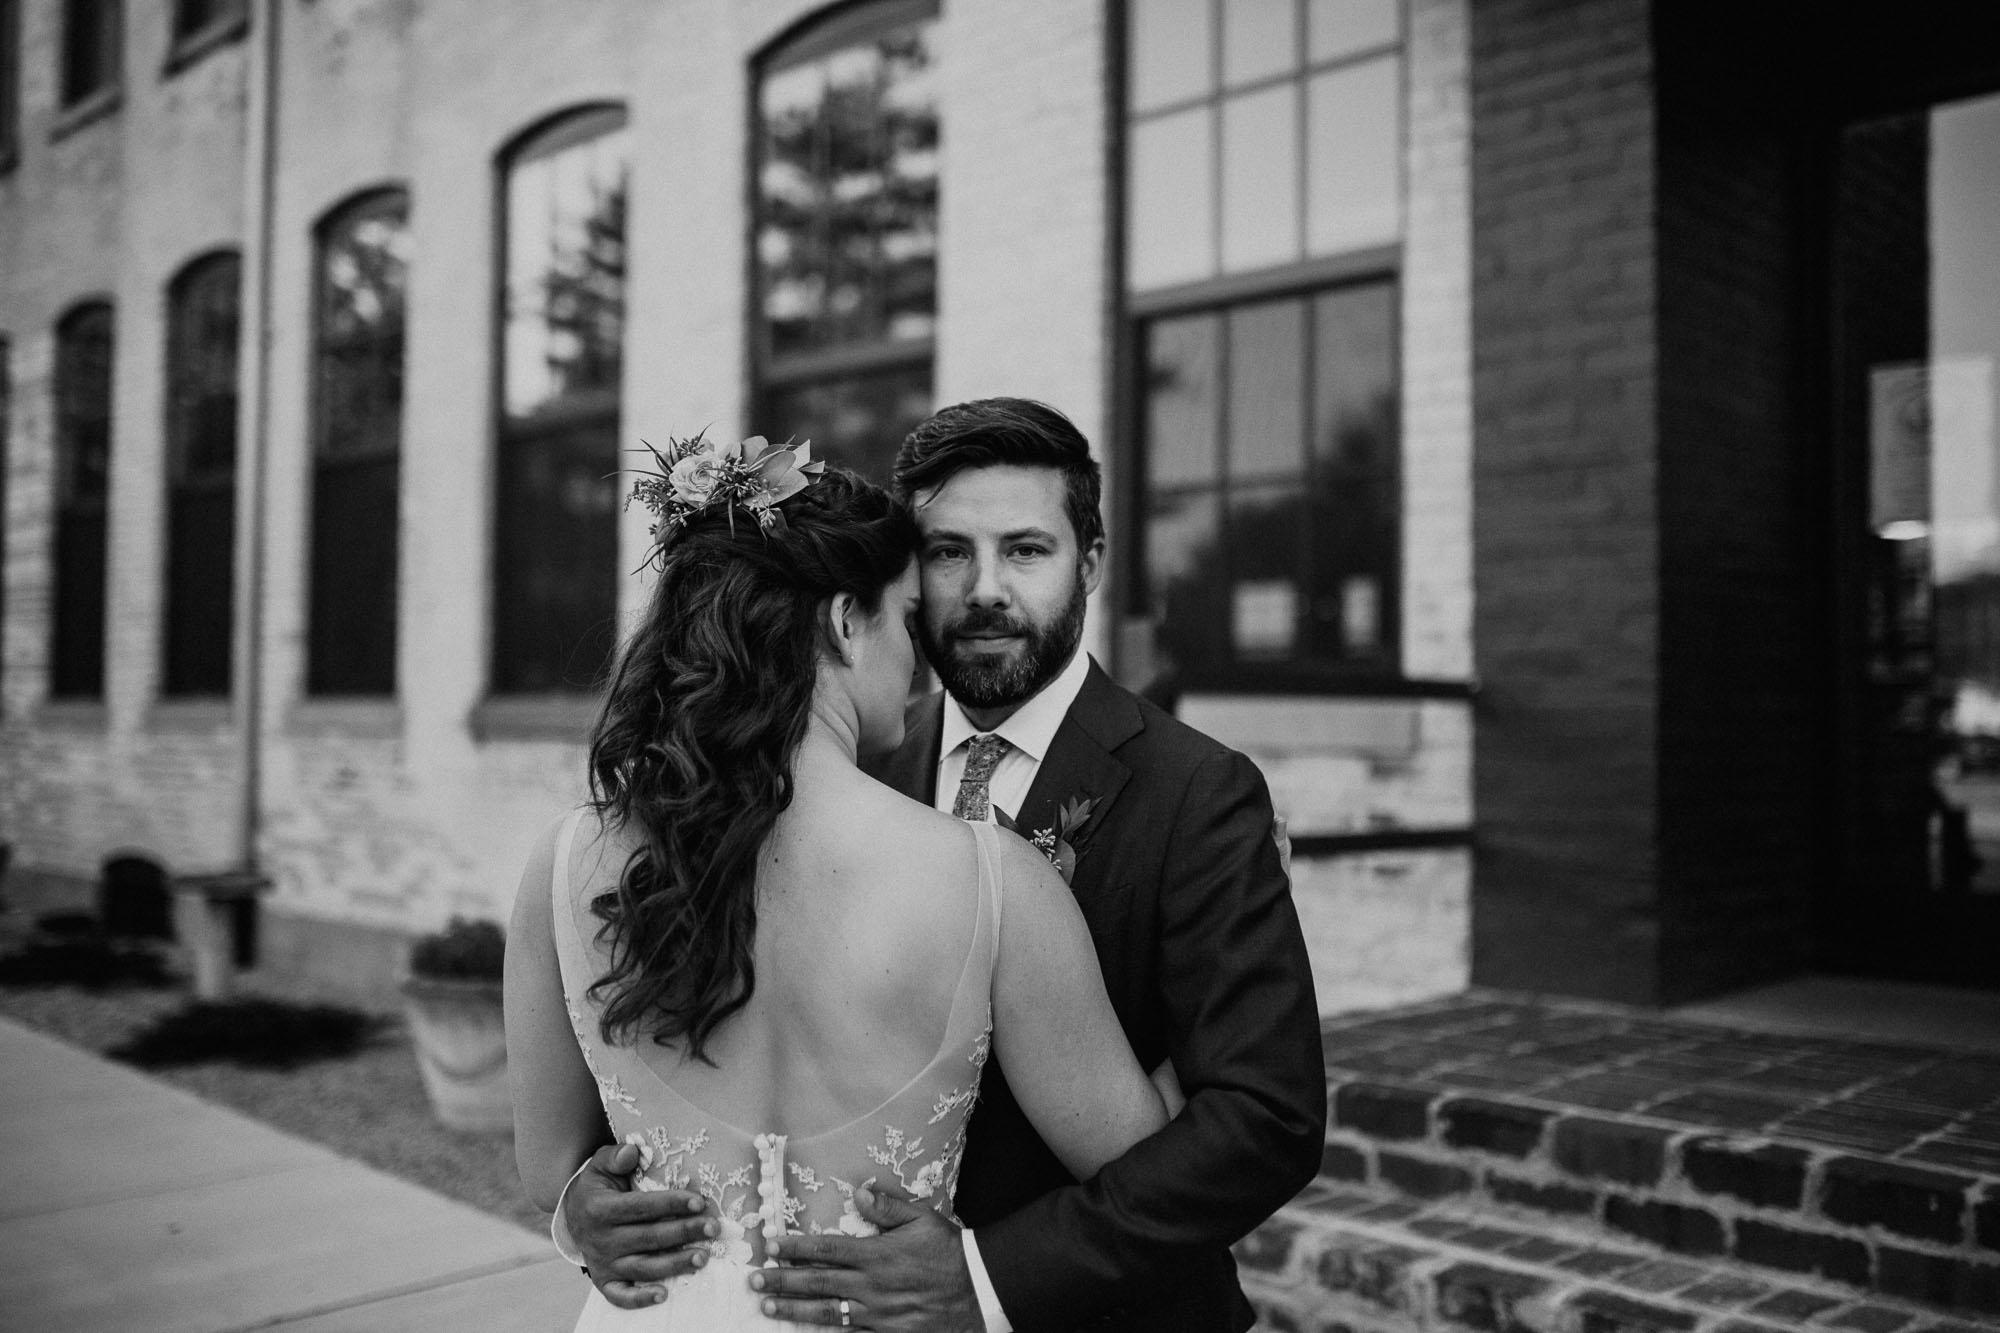 journeyman_distillery_wedding_photographer_chicago_il_wright_photographs-4618.jpg